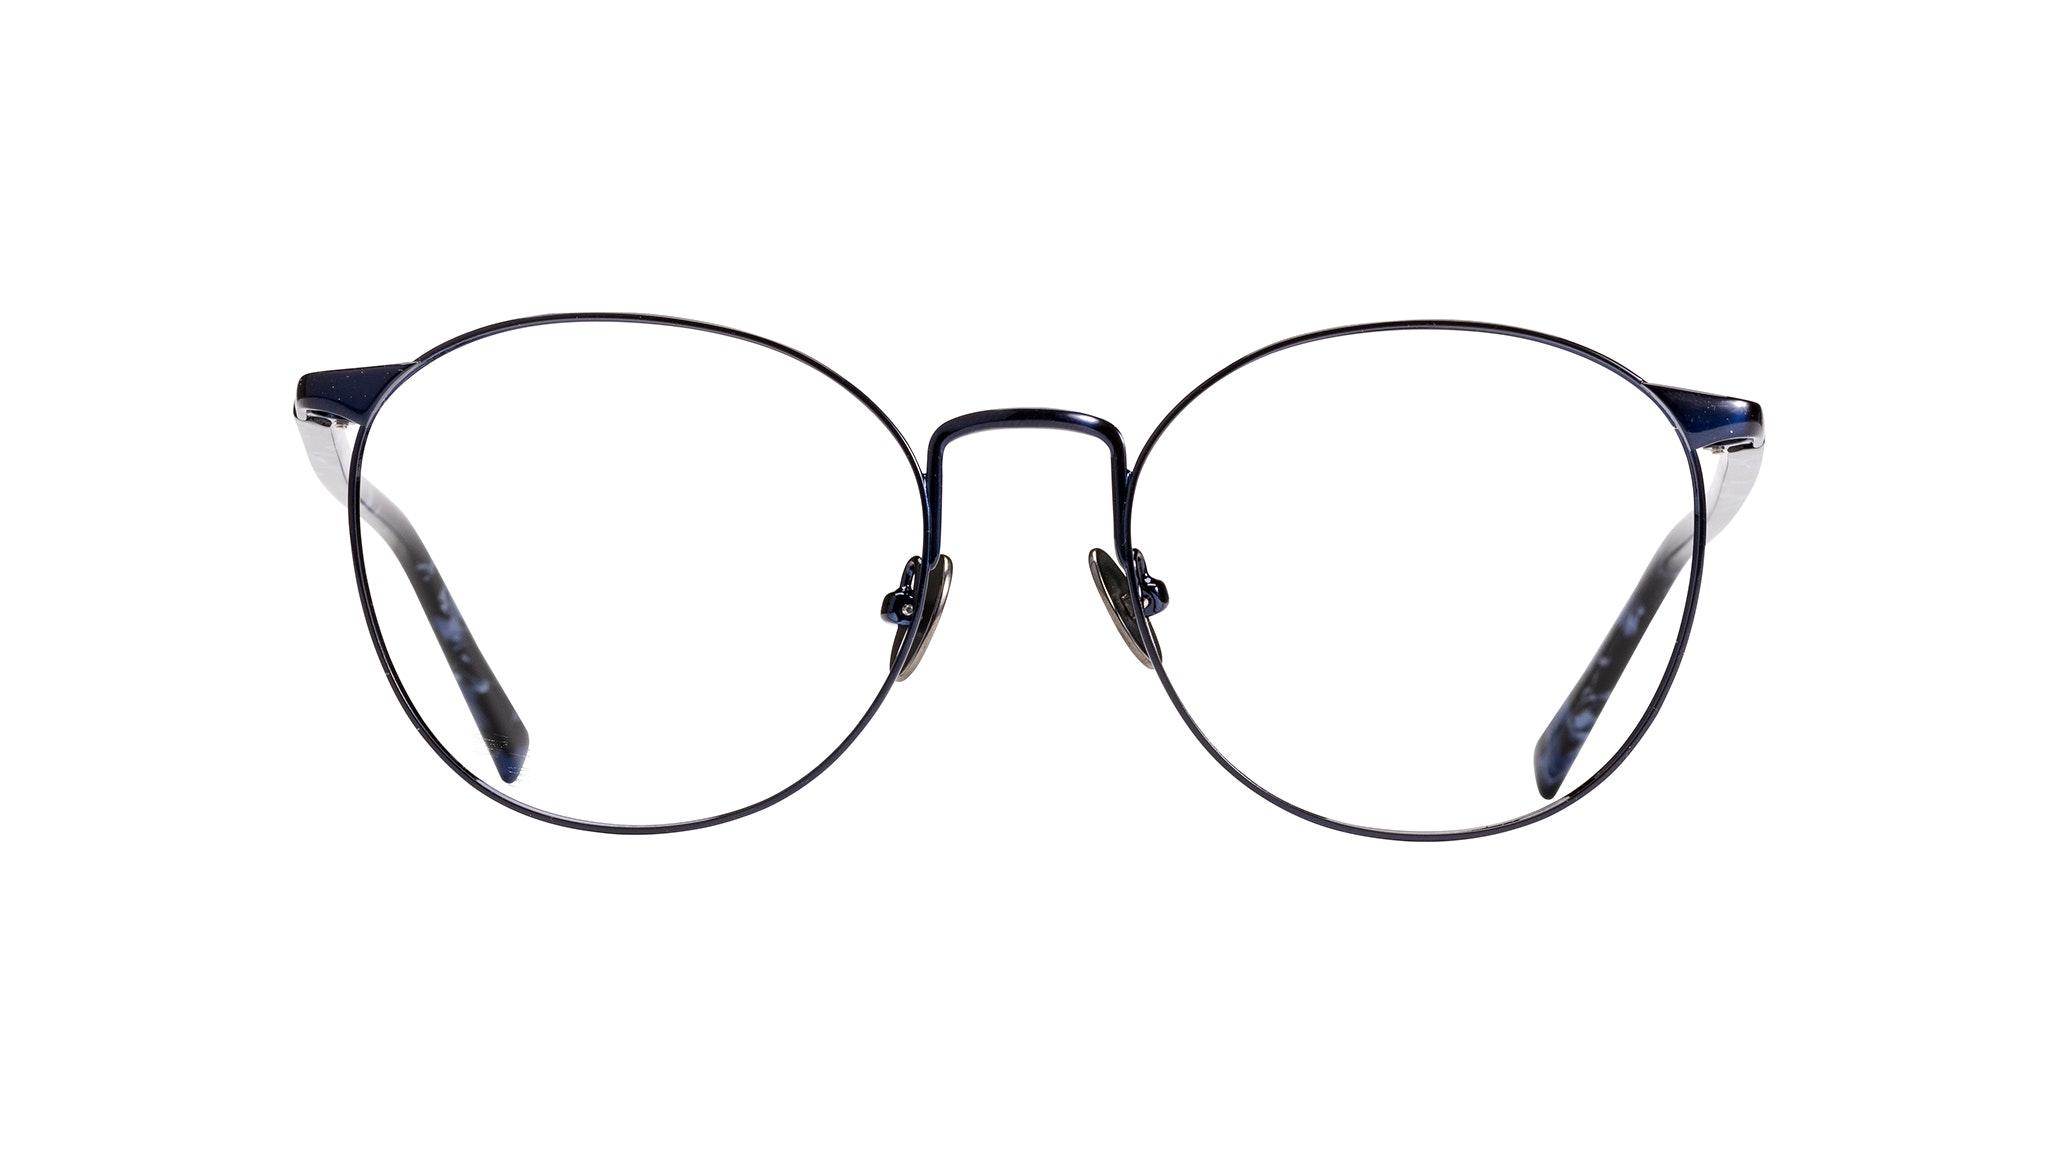 Affordable Fashion Glasses Round Eyeglasses Women Romy Penombre Front